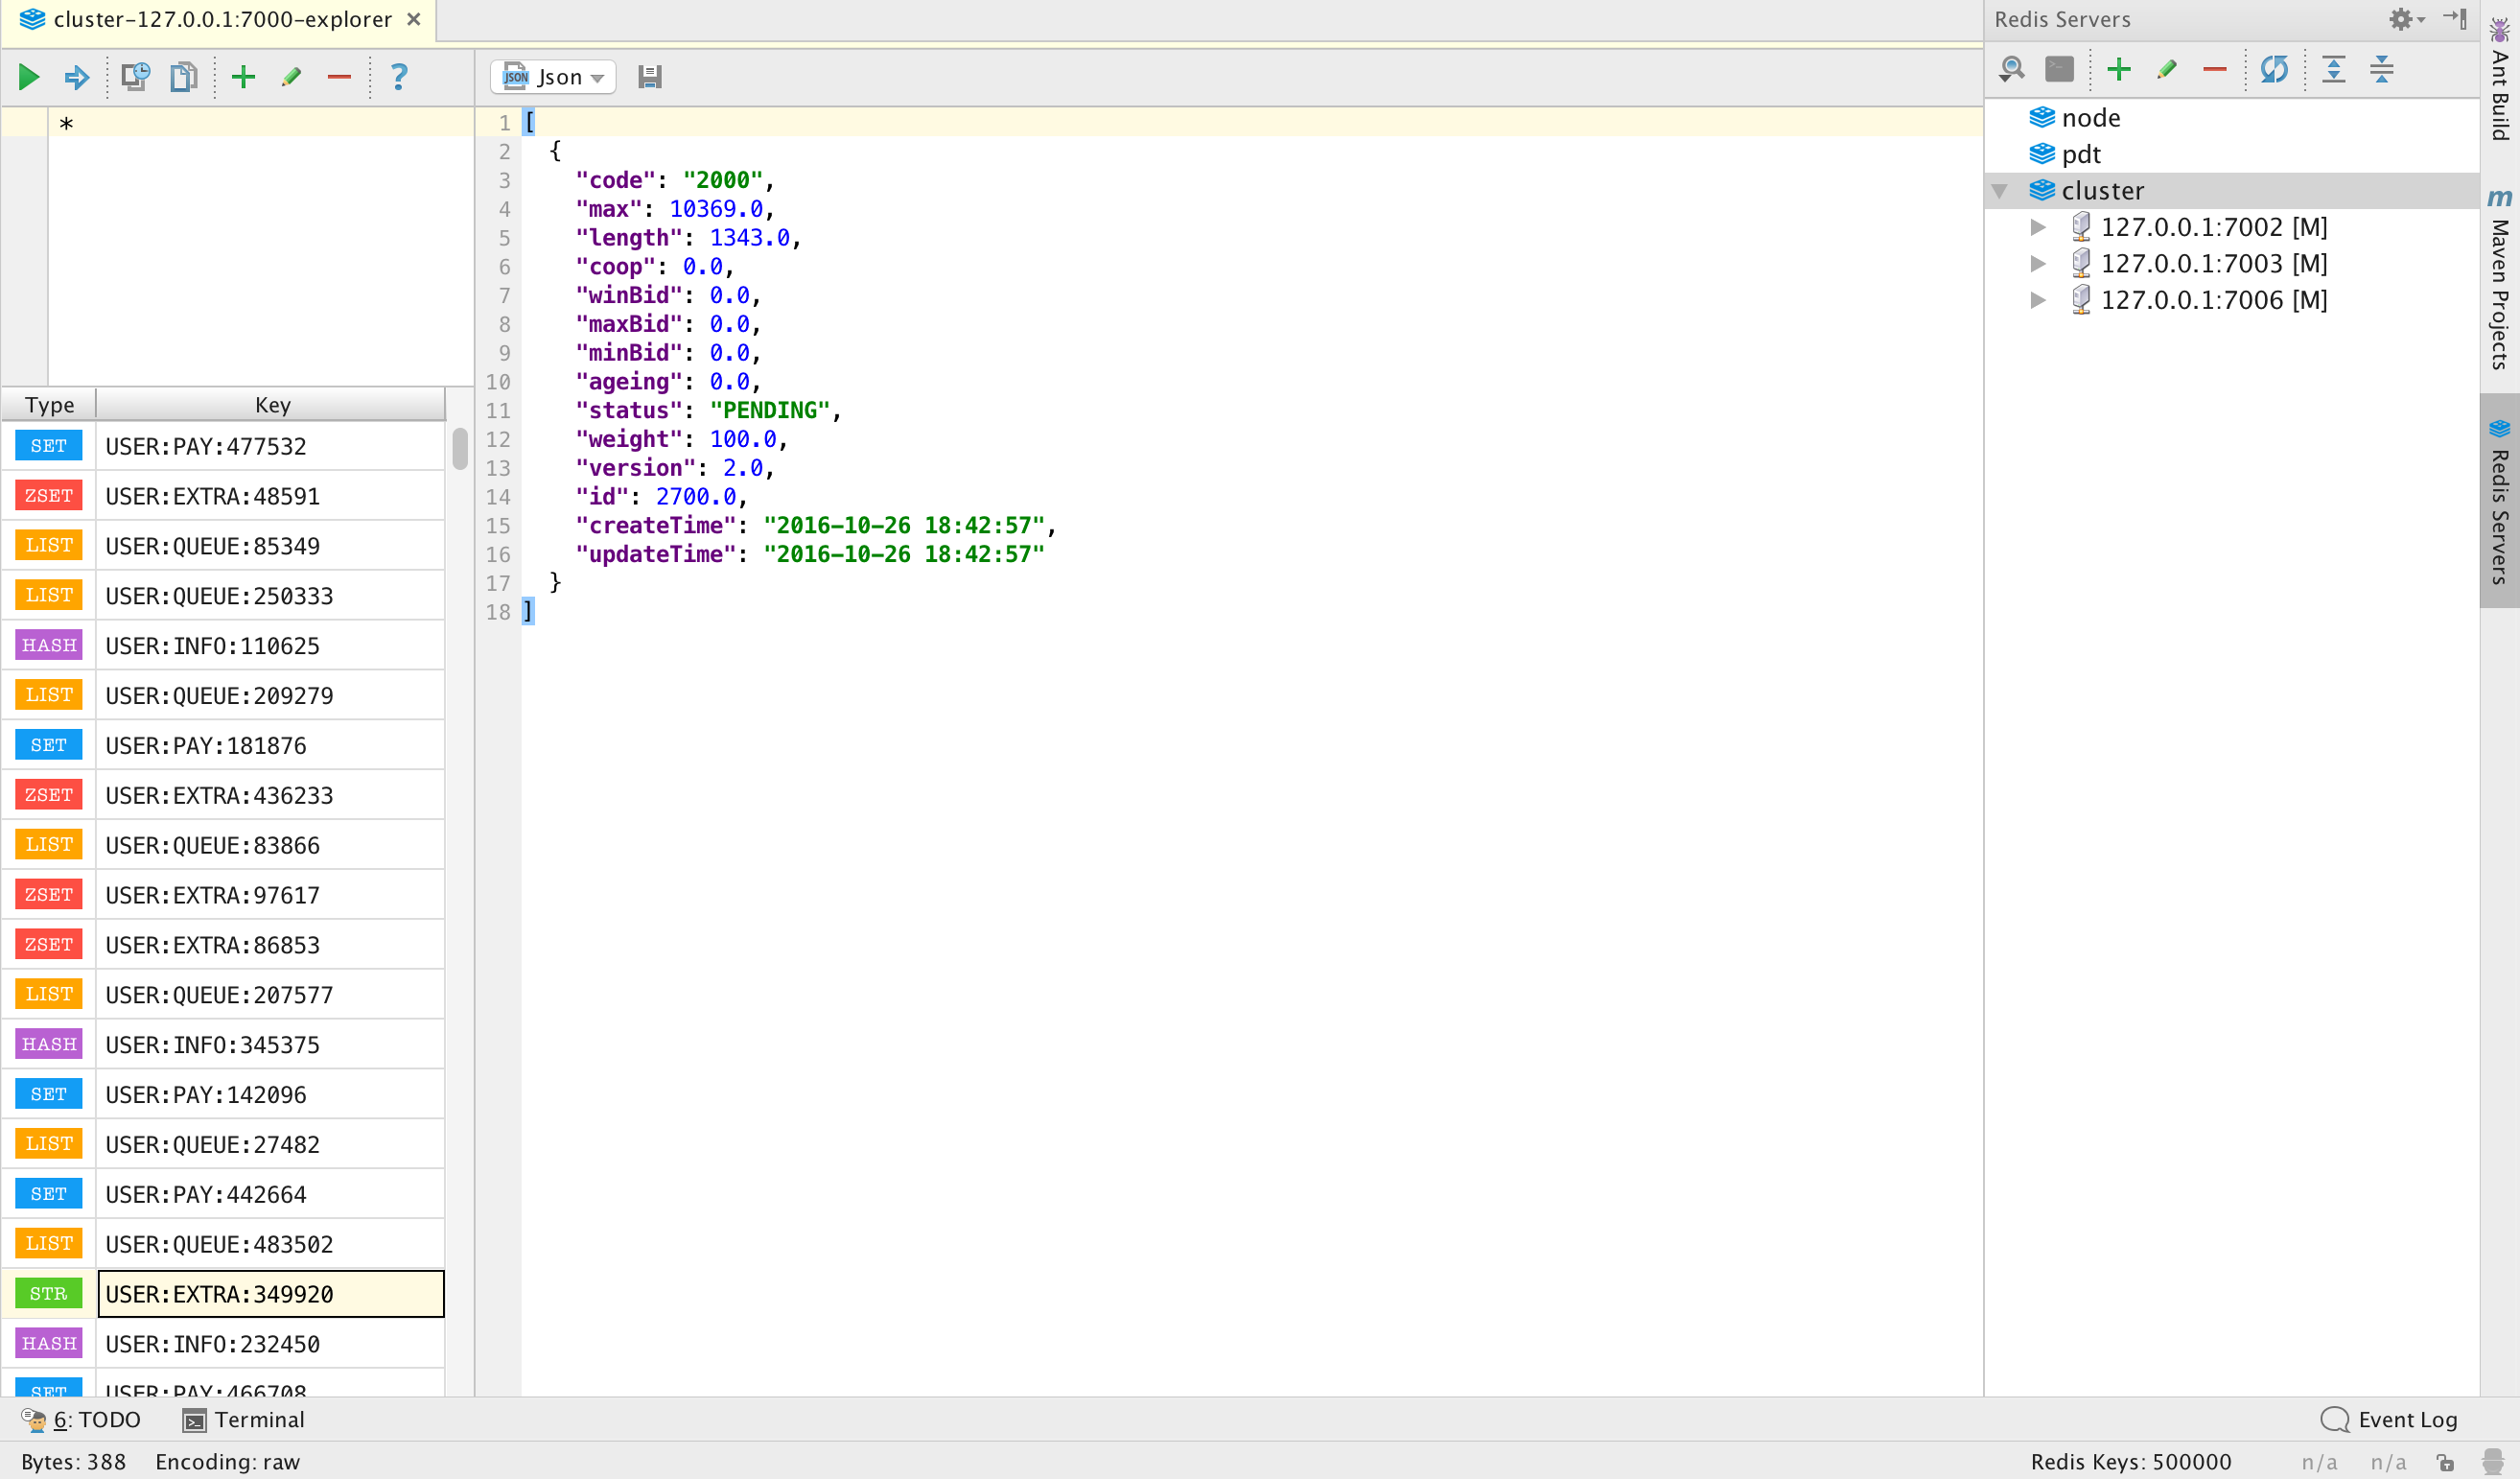 Screenshot #16398